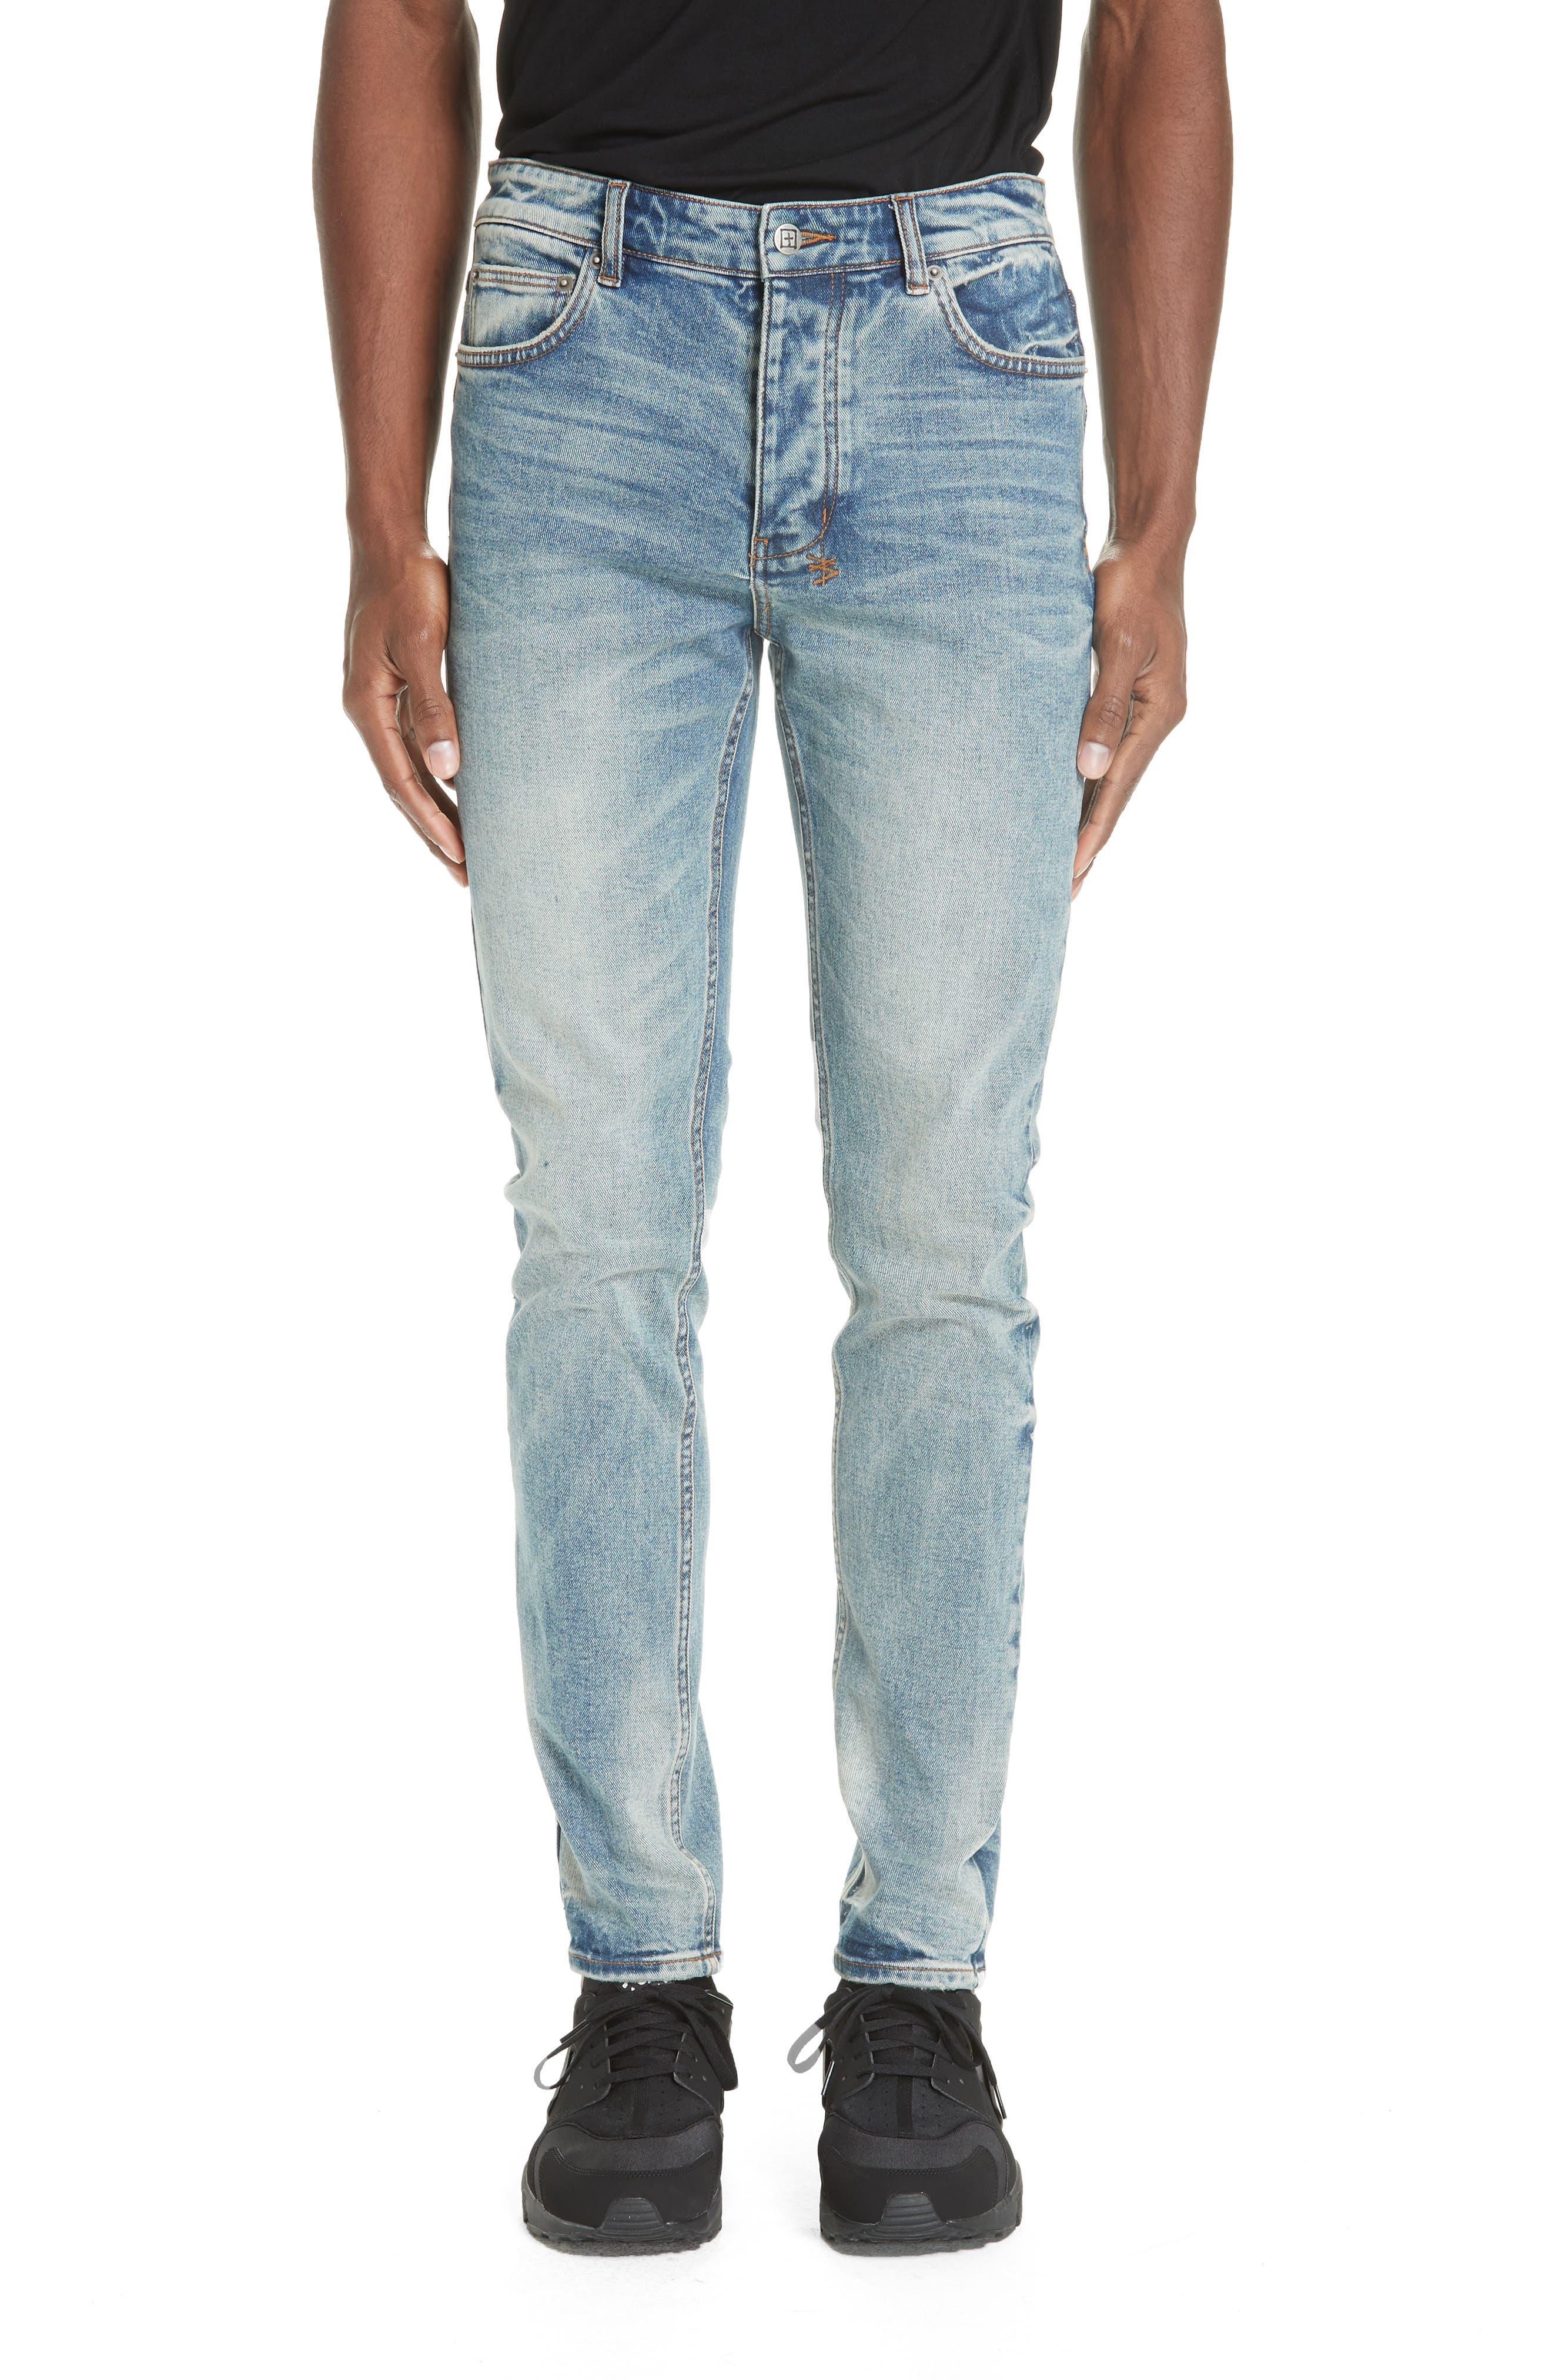 Men's Ksubi Chitch Pure Dynamite Skinny Fit Jeans